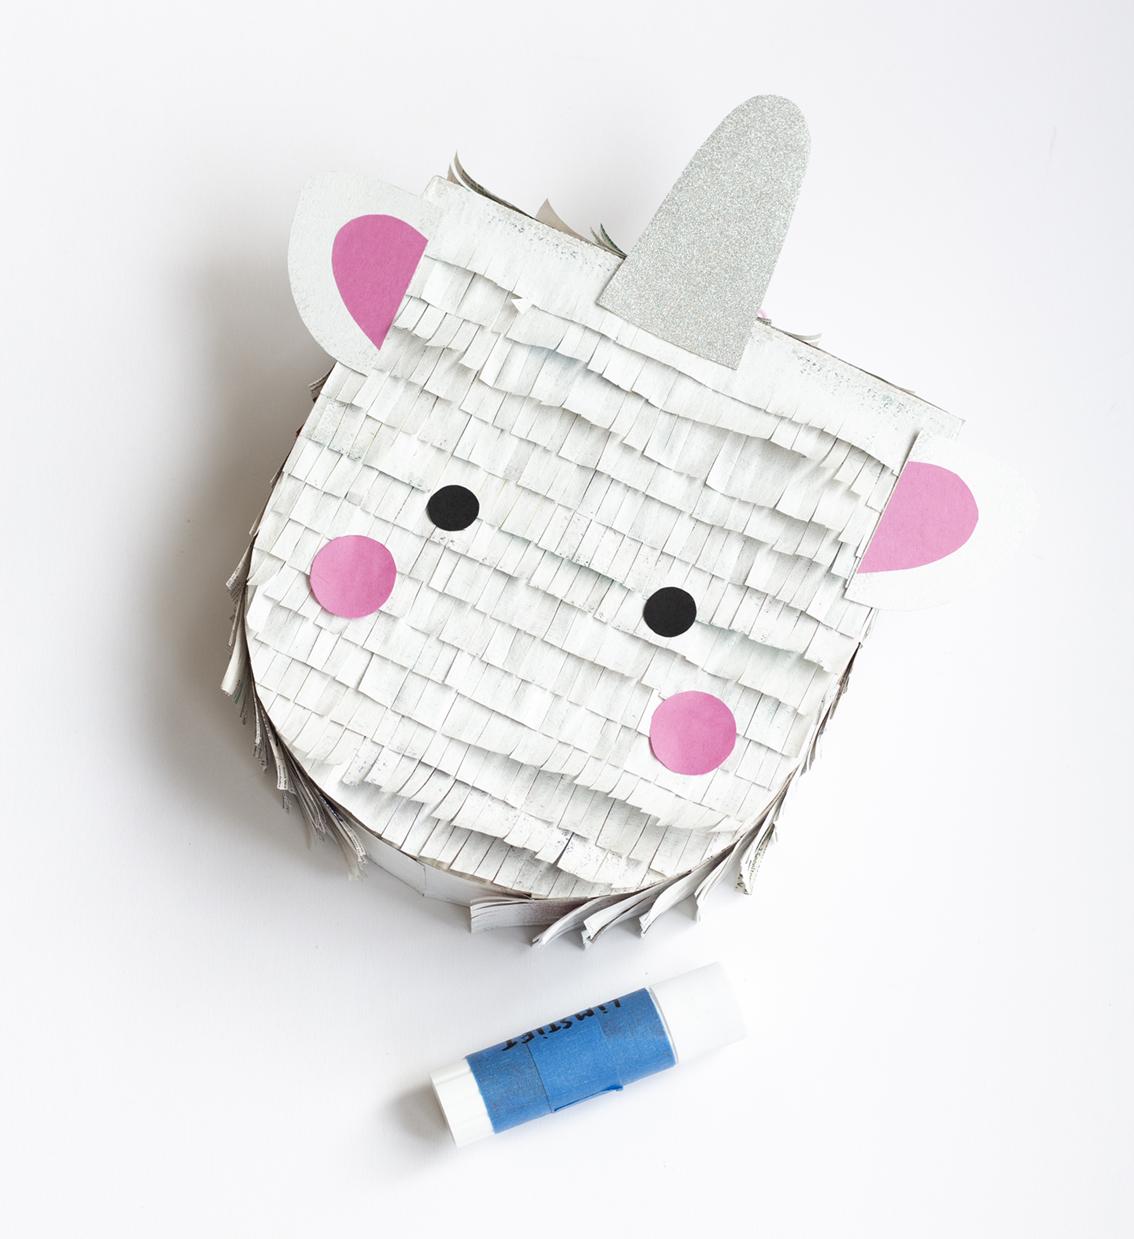 Piñata i kartong | Pysselbolaget